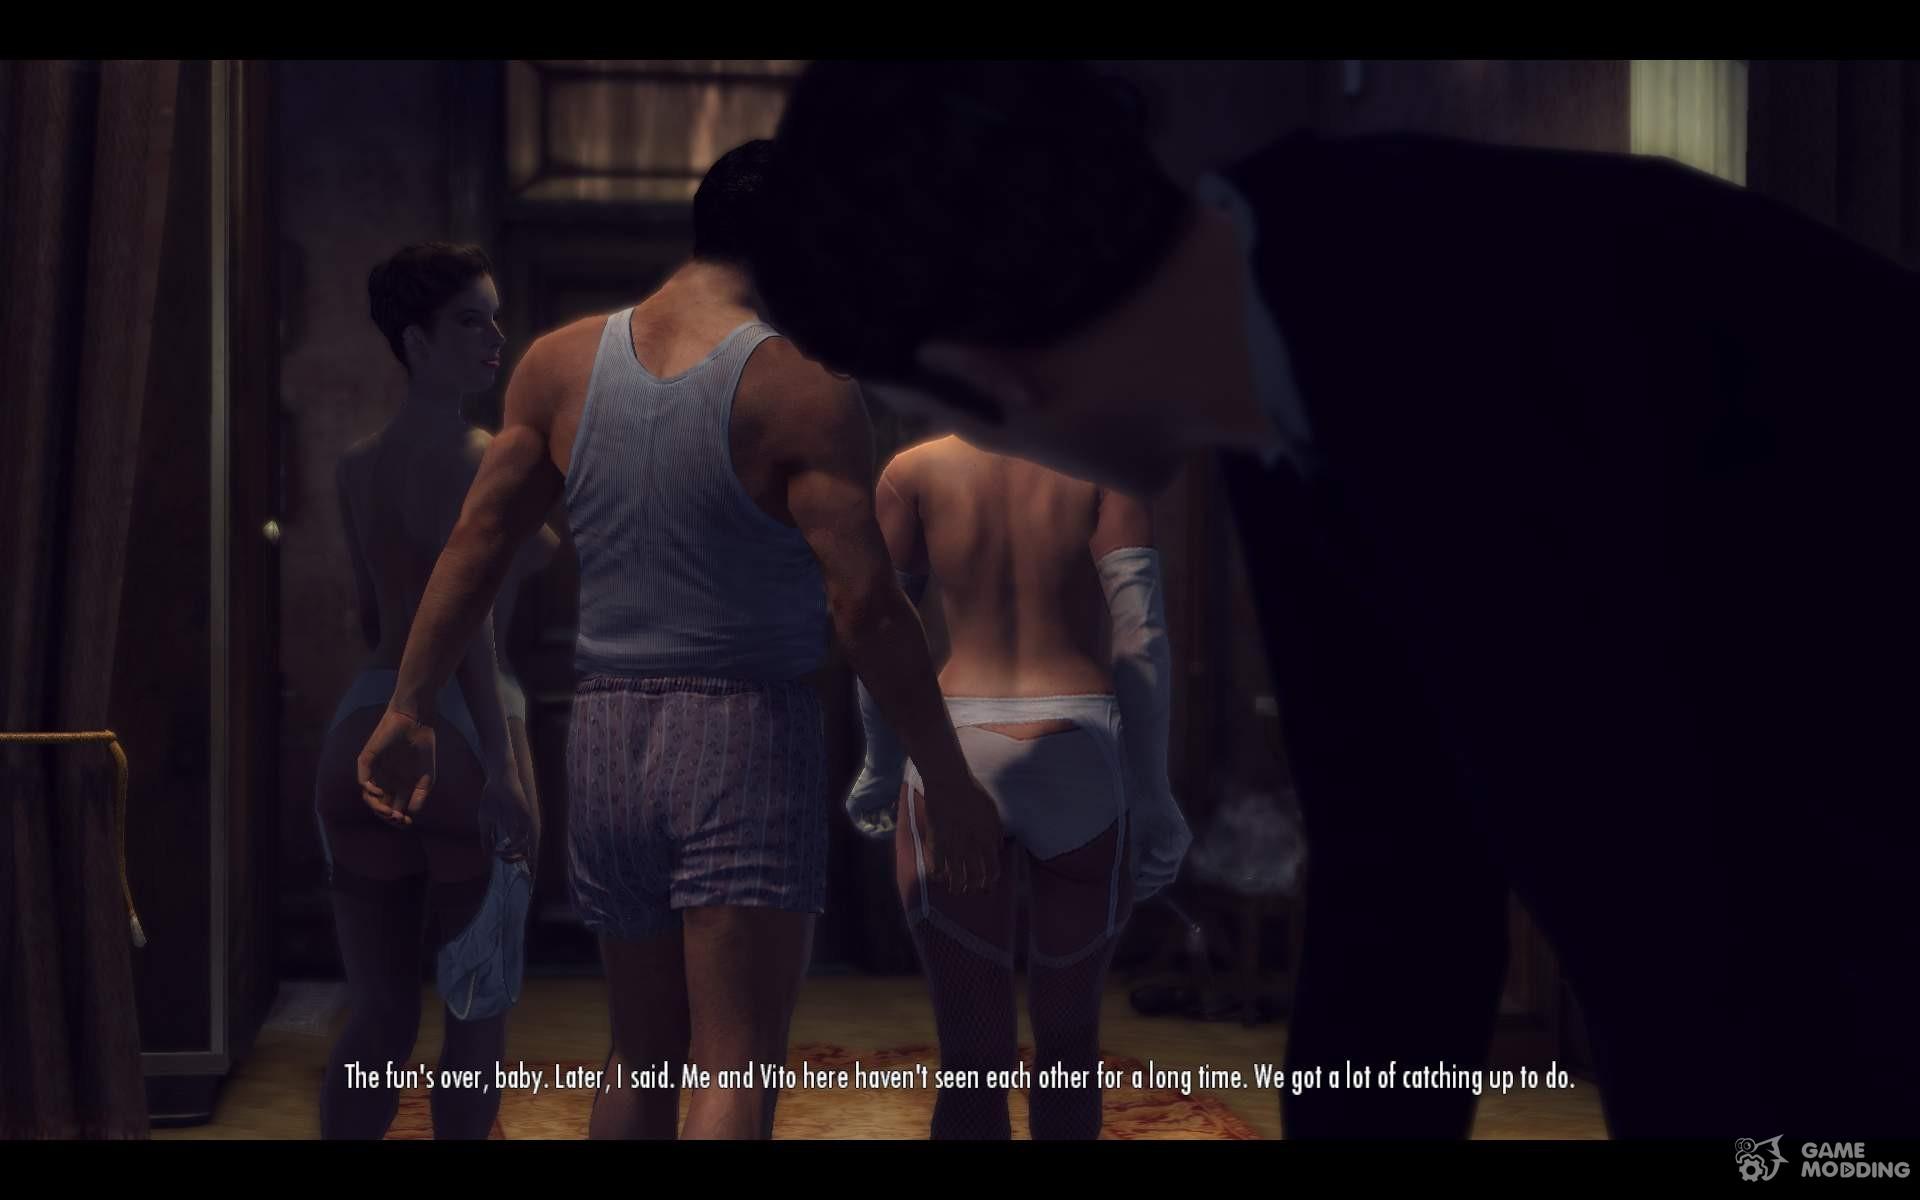 Mafia 2 Nude Mod